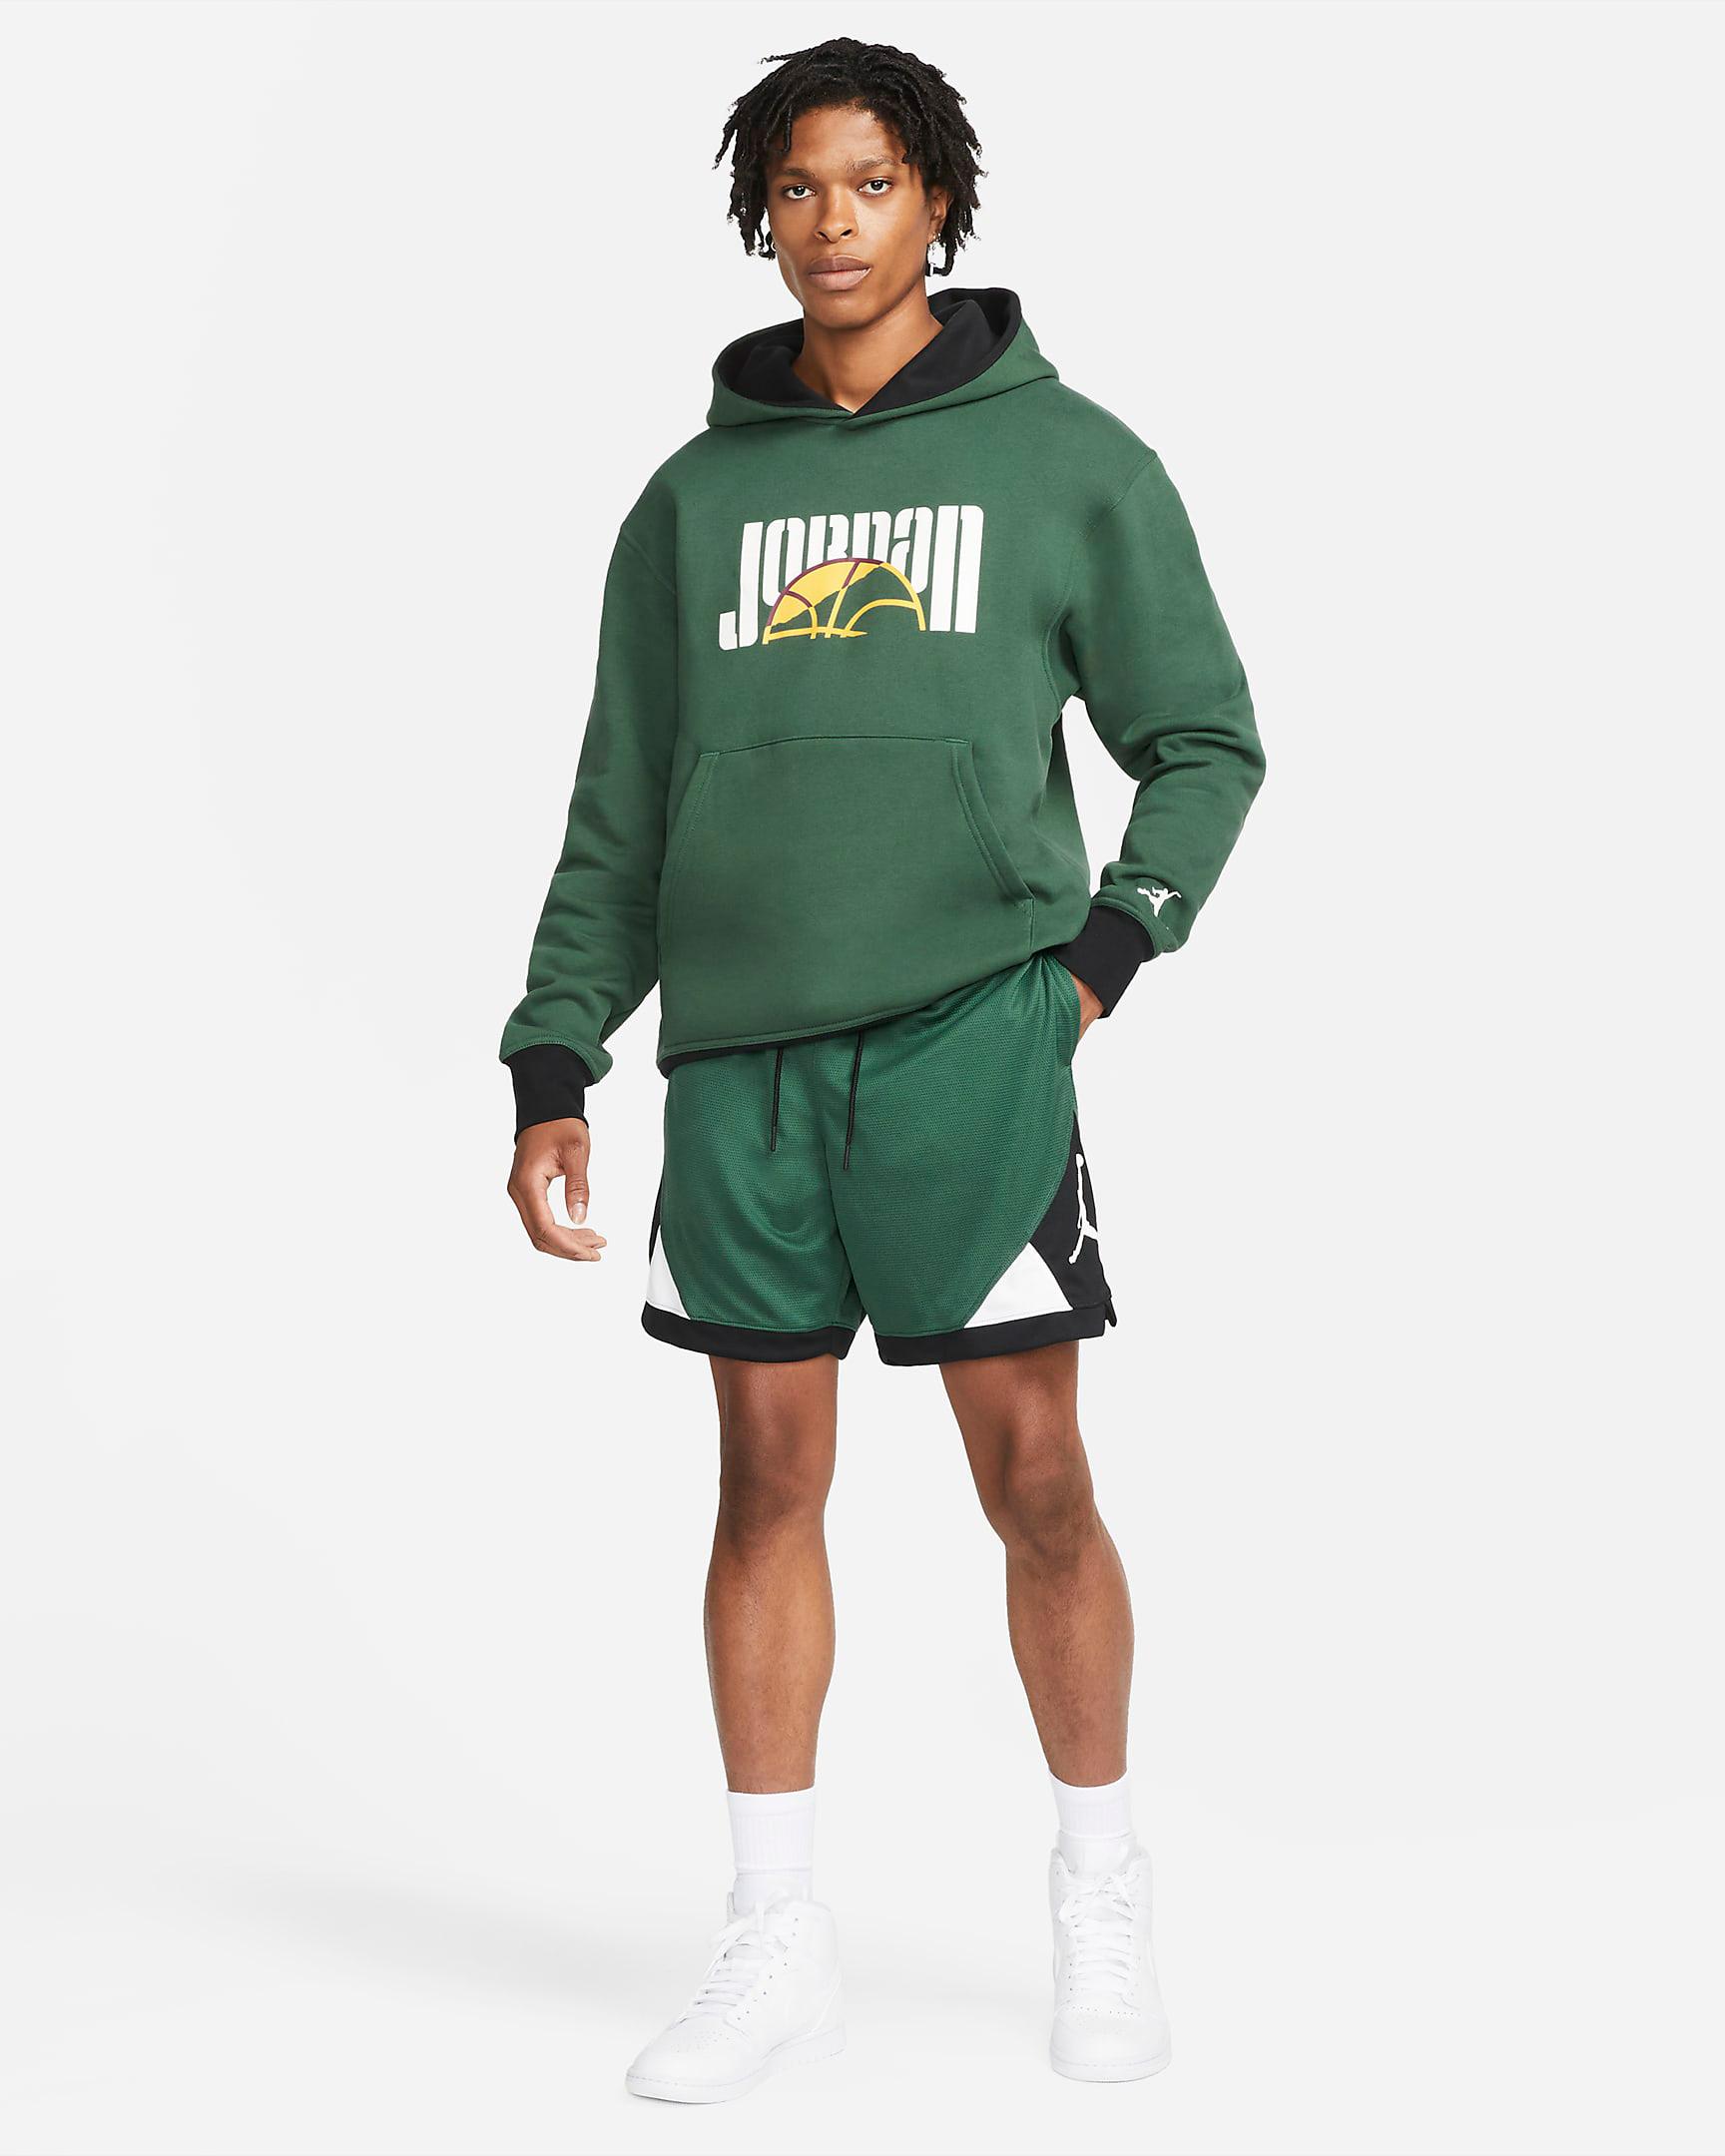 jordan-noble-green-dri-fit-air-diamond-shorts-hoodie-outfit